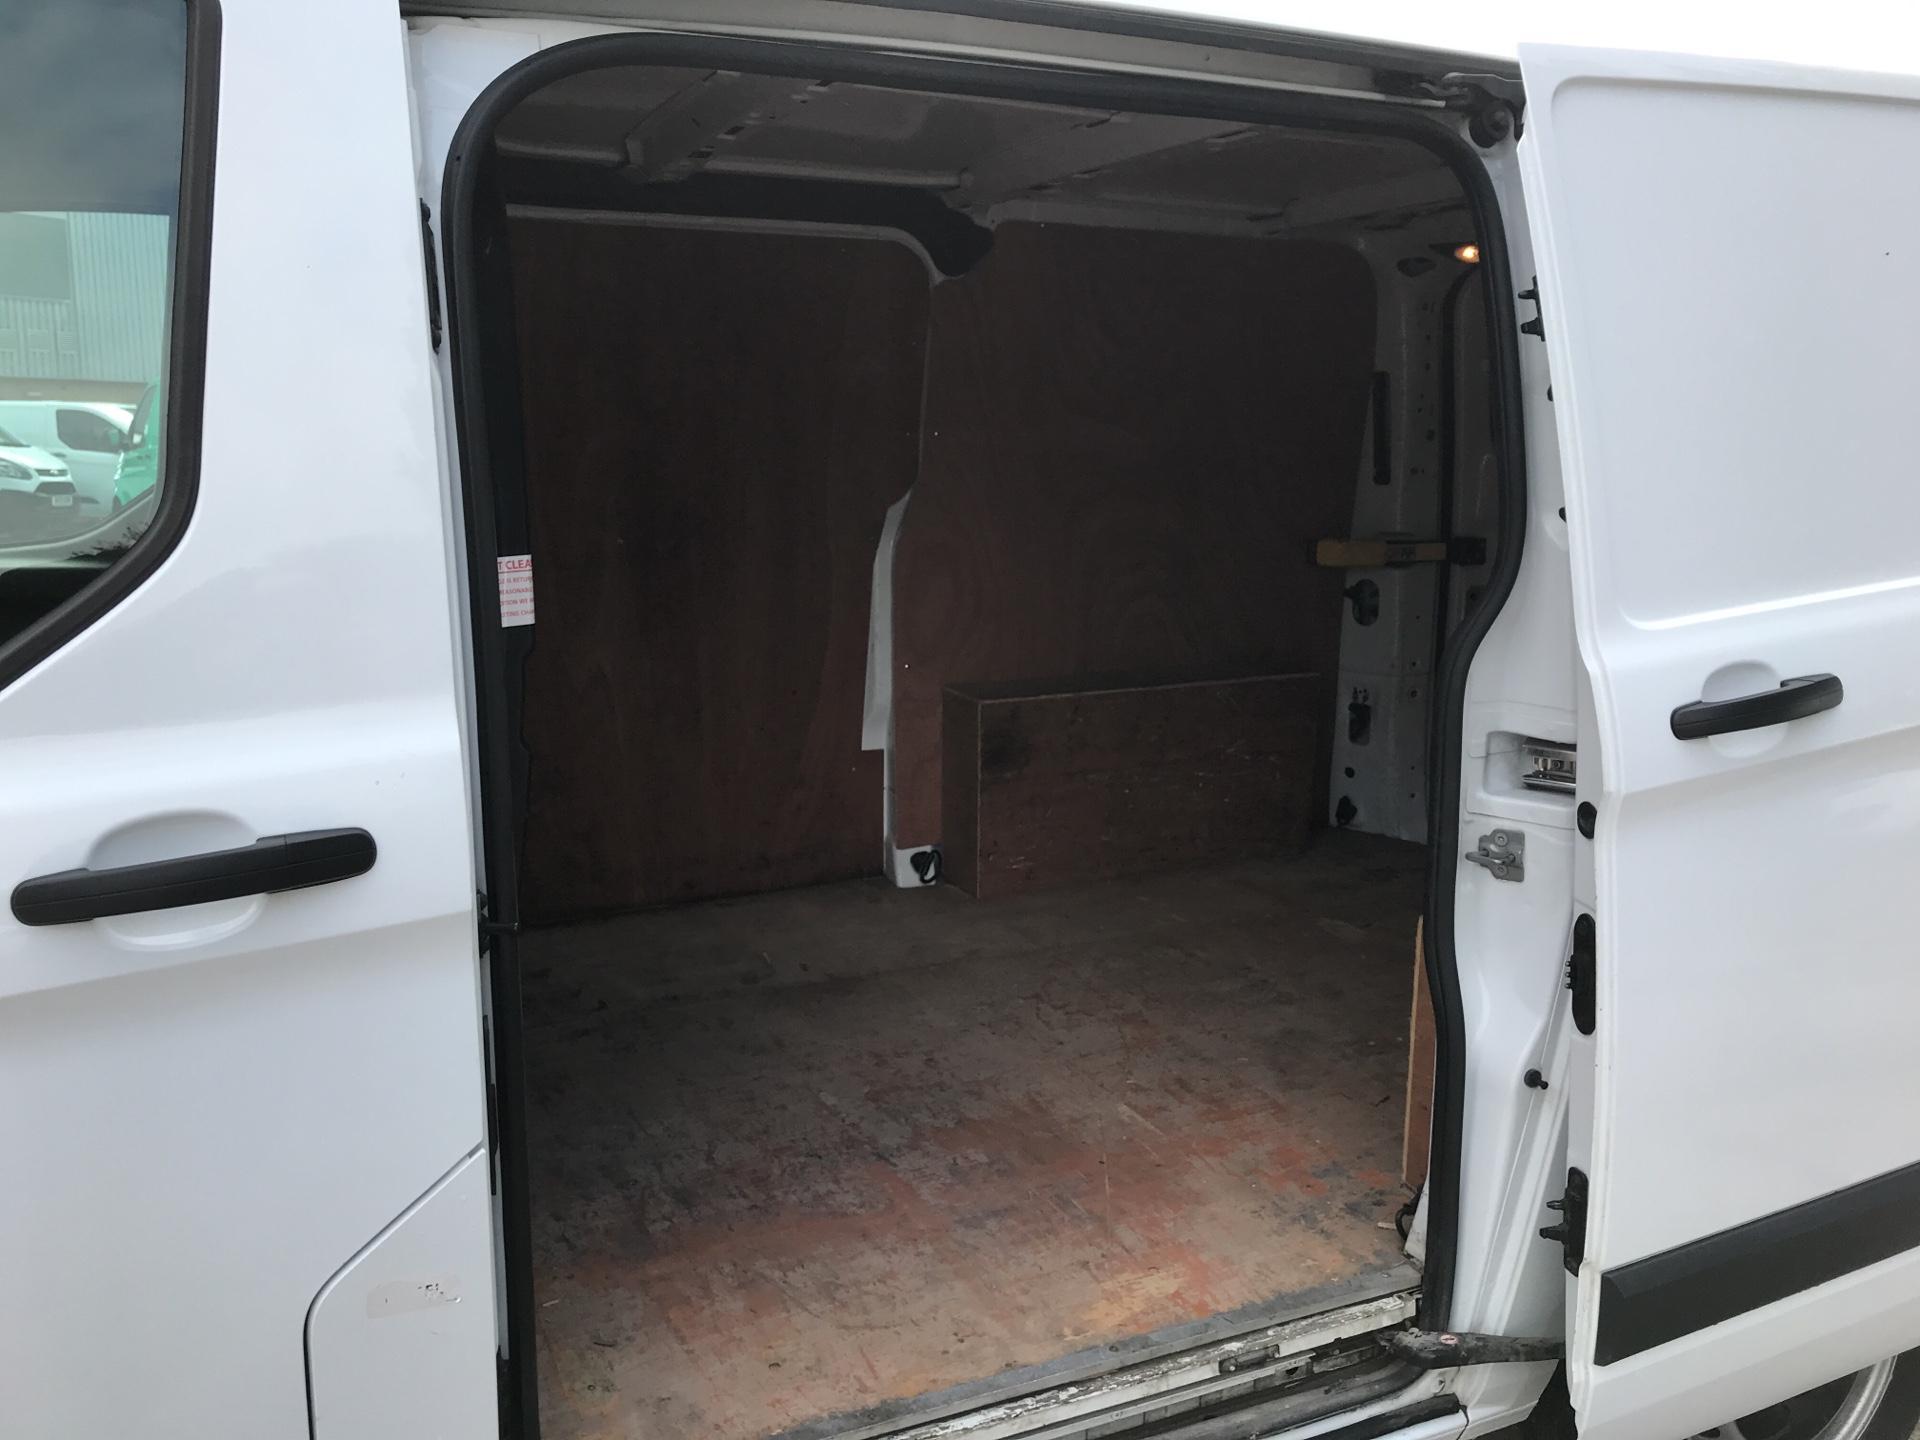 2017 Ford Transit Custom 290 L1 DIESEL FWD 2.0 TDCI 105PS LOW ROOF VAN EURO 6 (BN17OZL) Image 17